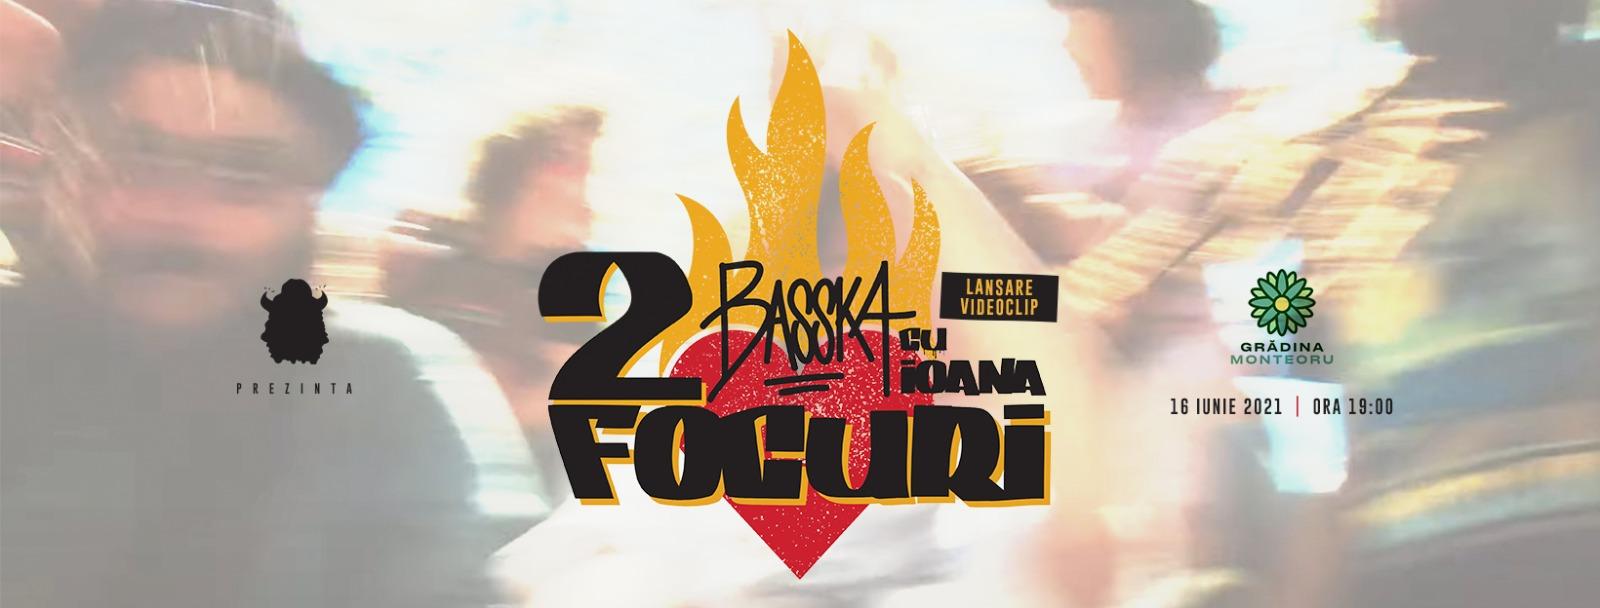 Trupa BASSKA a lansat videoclipul pentru piesa 2 Focuri